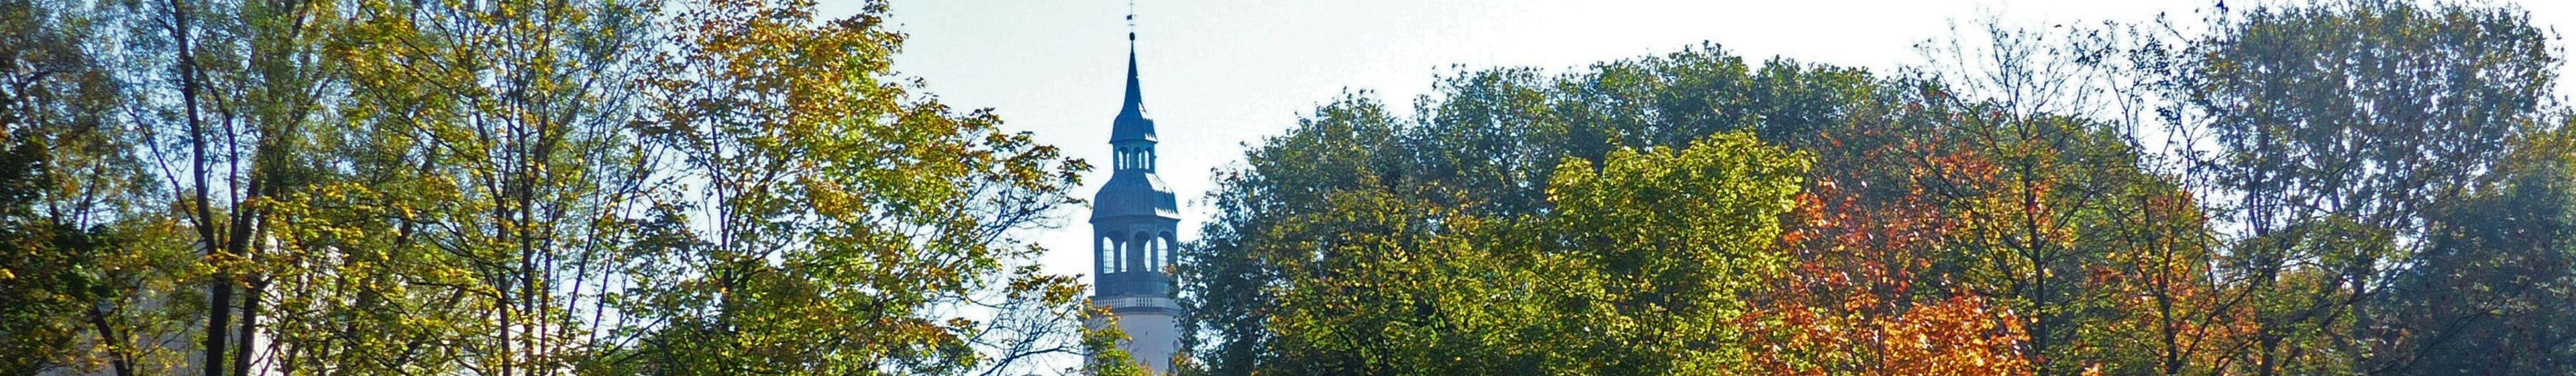 Kirchturm mit Baeumen-2